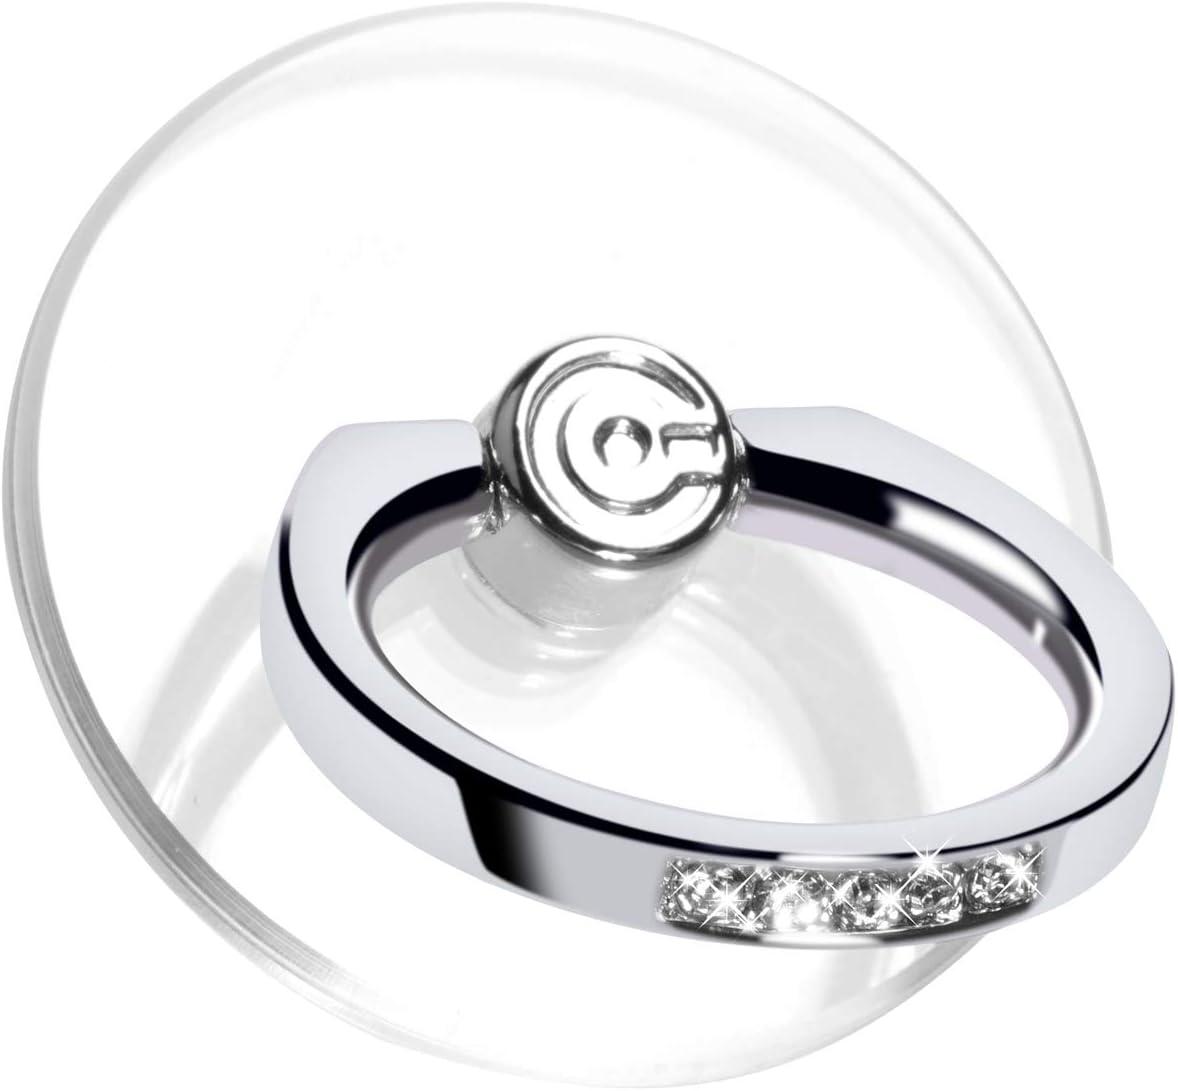 Transparent Phone Ring Stand Holder - EI Sonador Cell Phone Ring Holder Finger Grip 360 Degree Rotation (2 Silver Diamond)